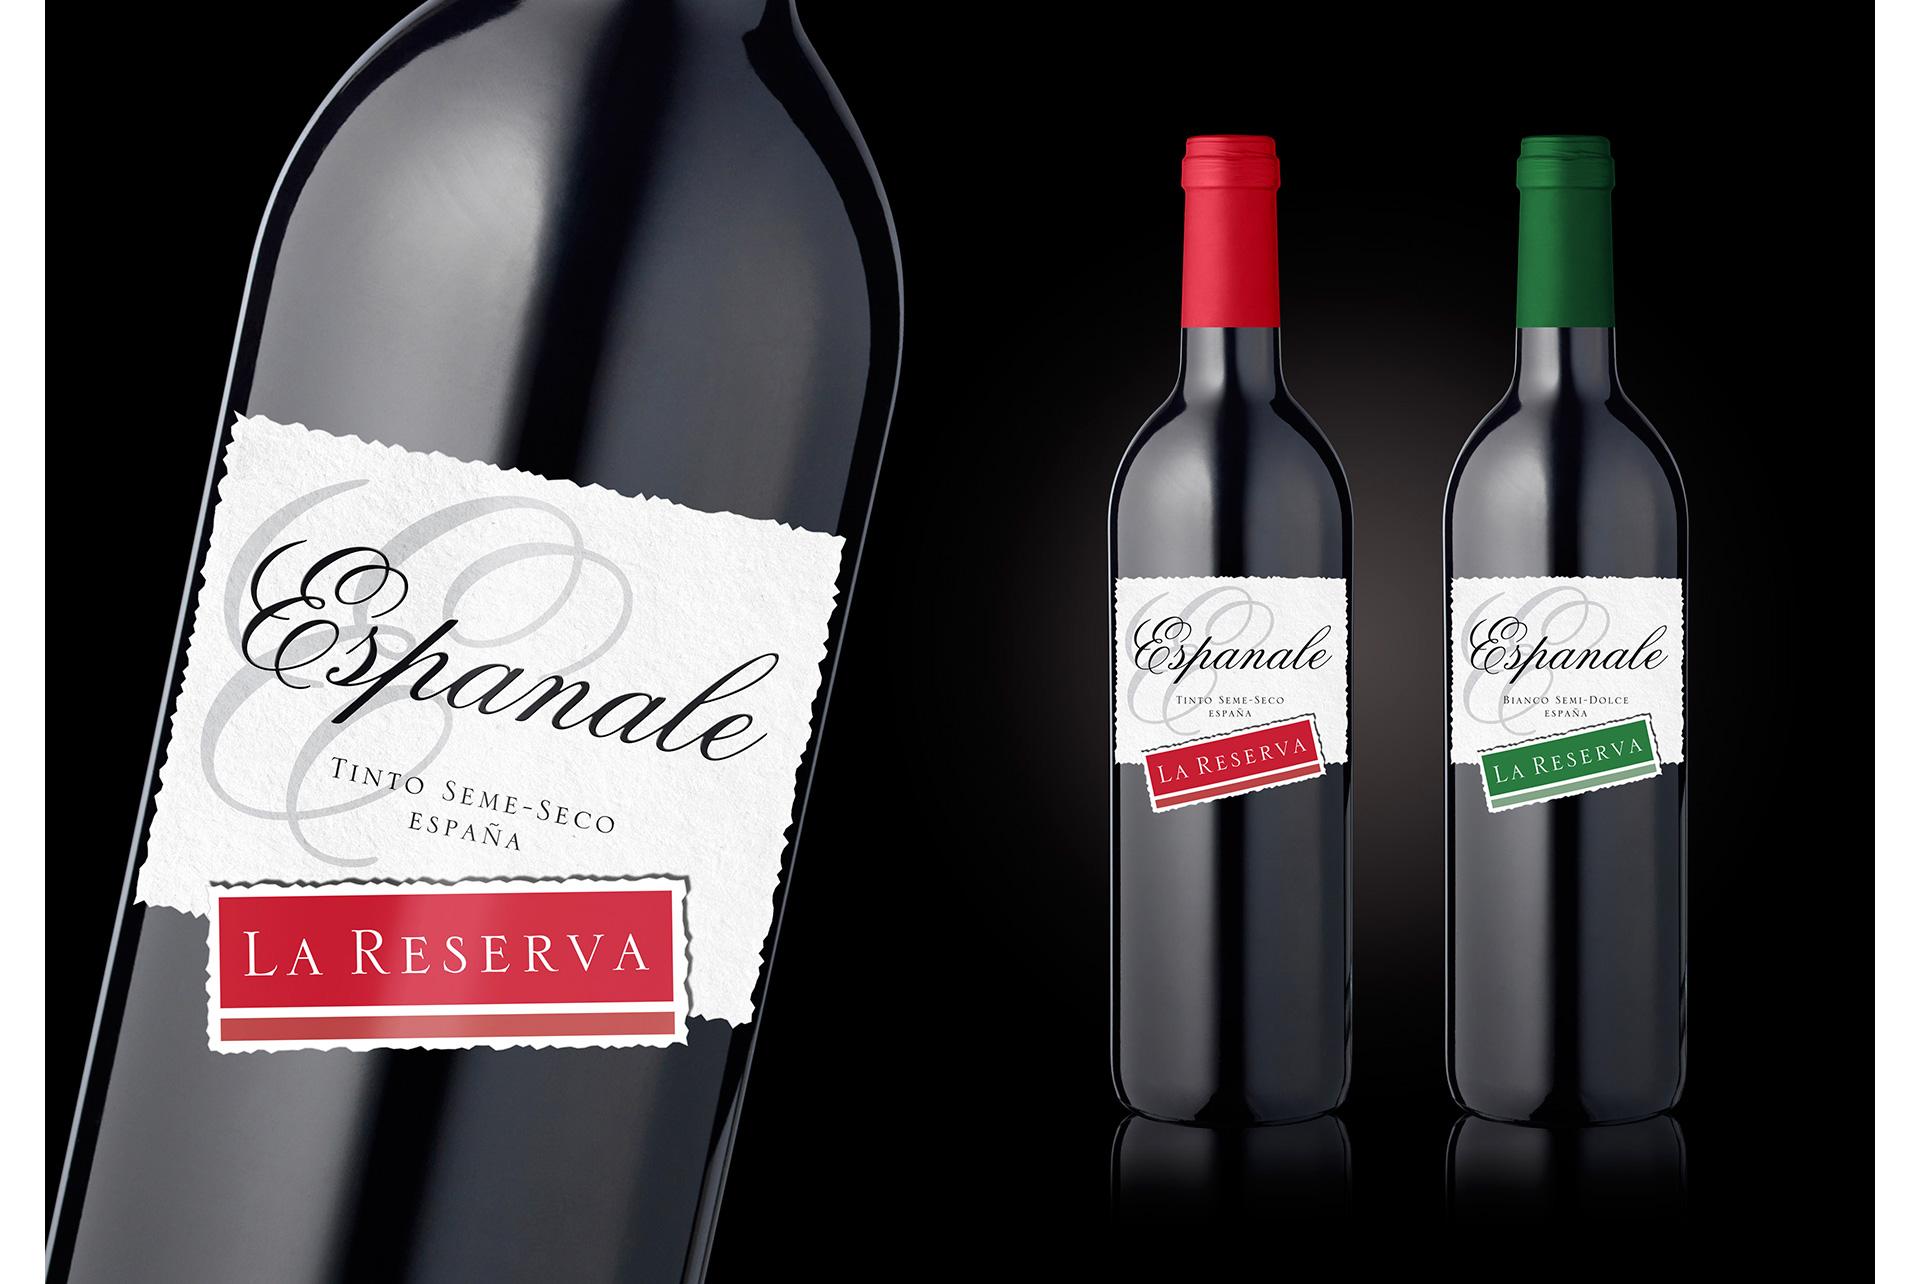 Projekt etykiety wina Espanale